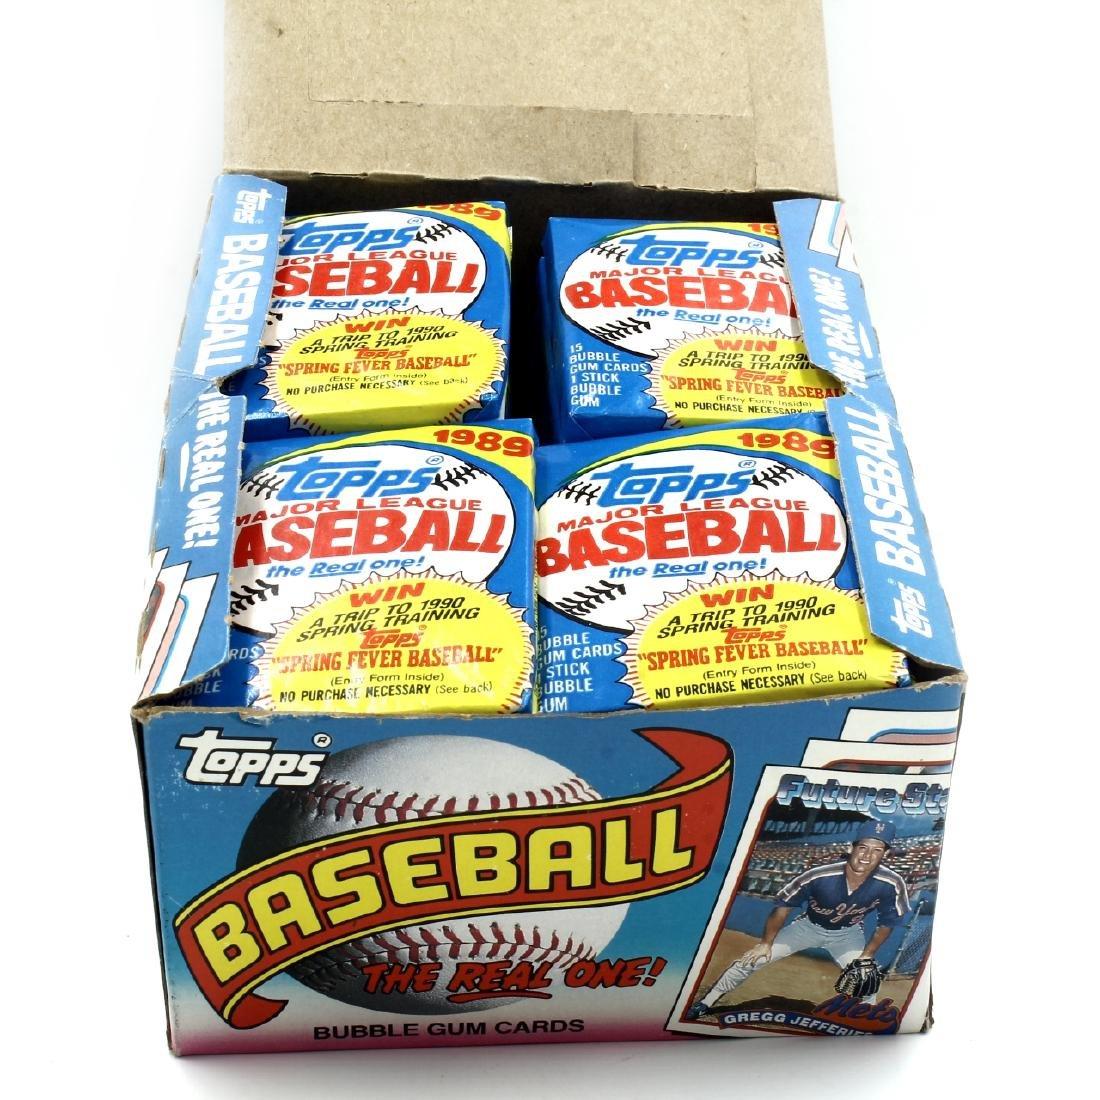 Cards, 1989 Topps Gum Wrap, Box